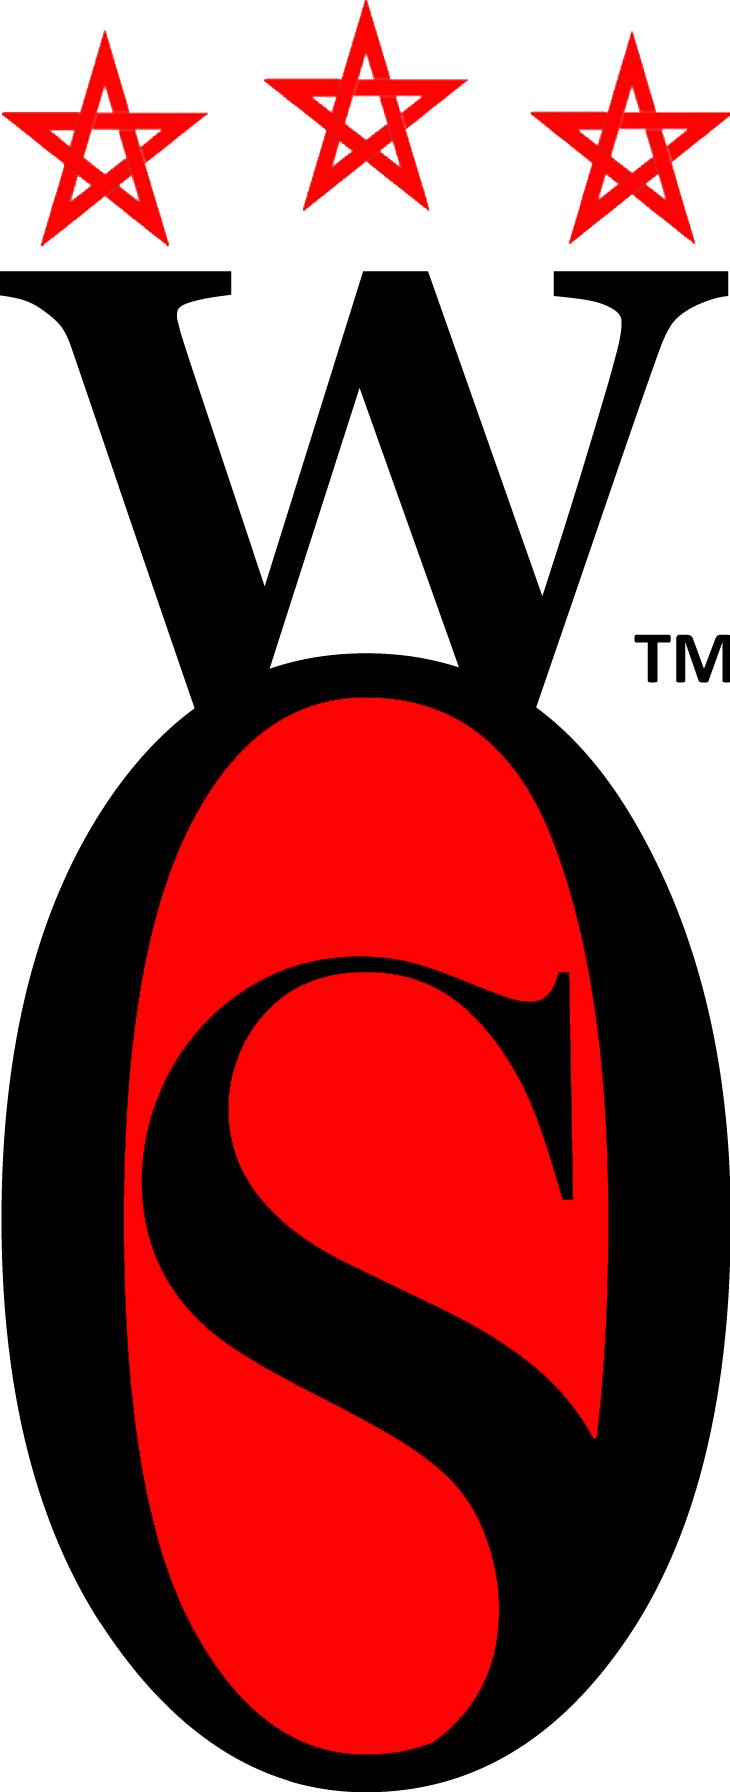 Wso initial